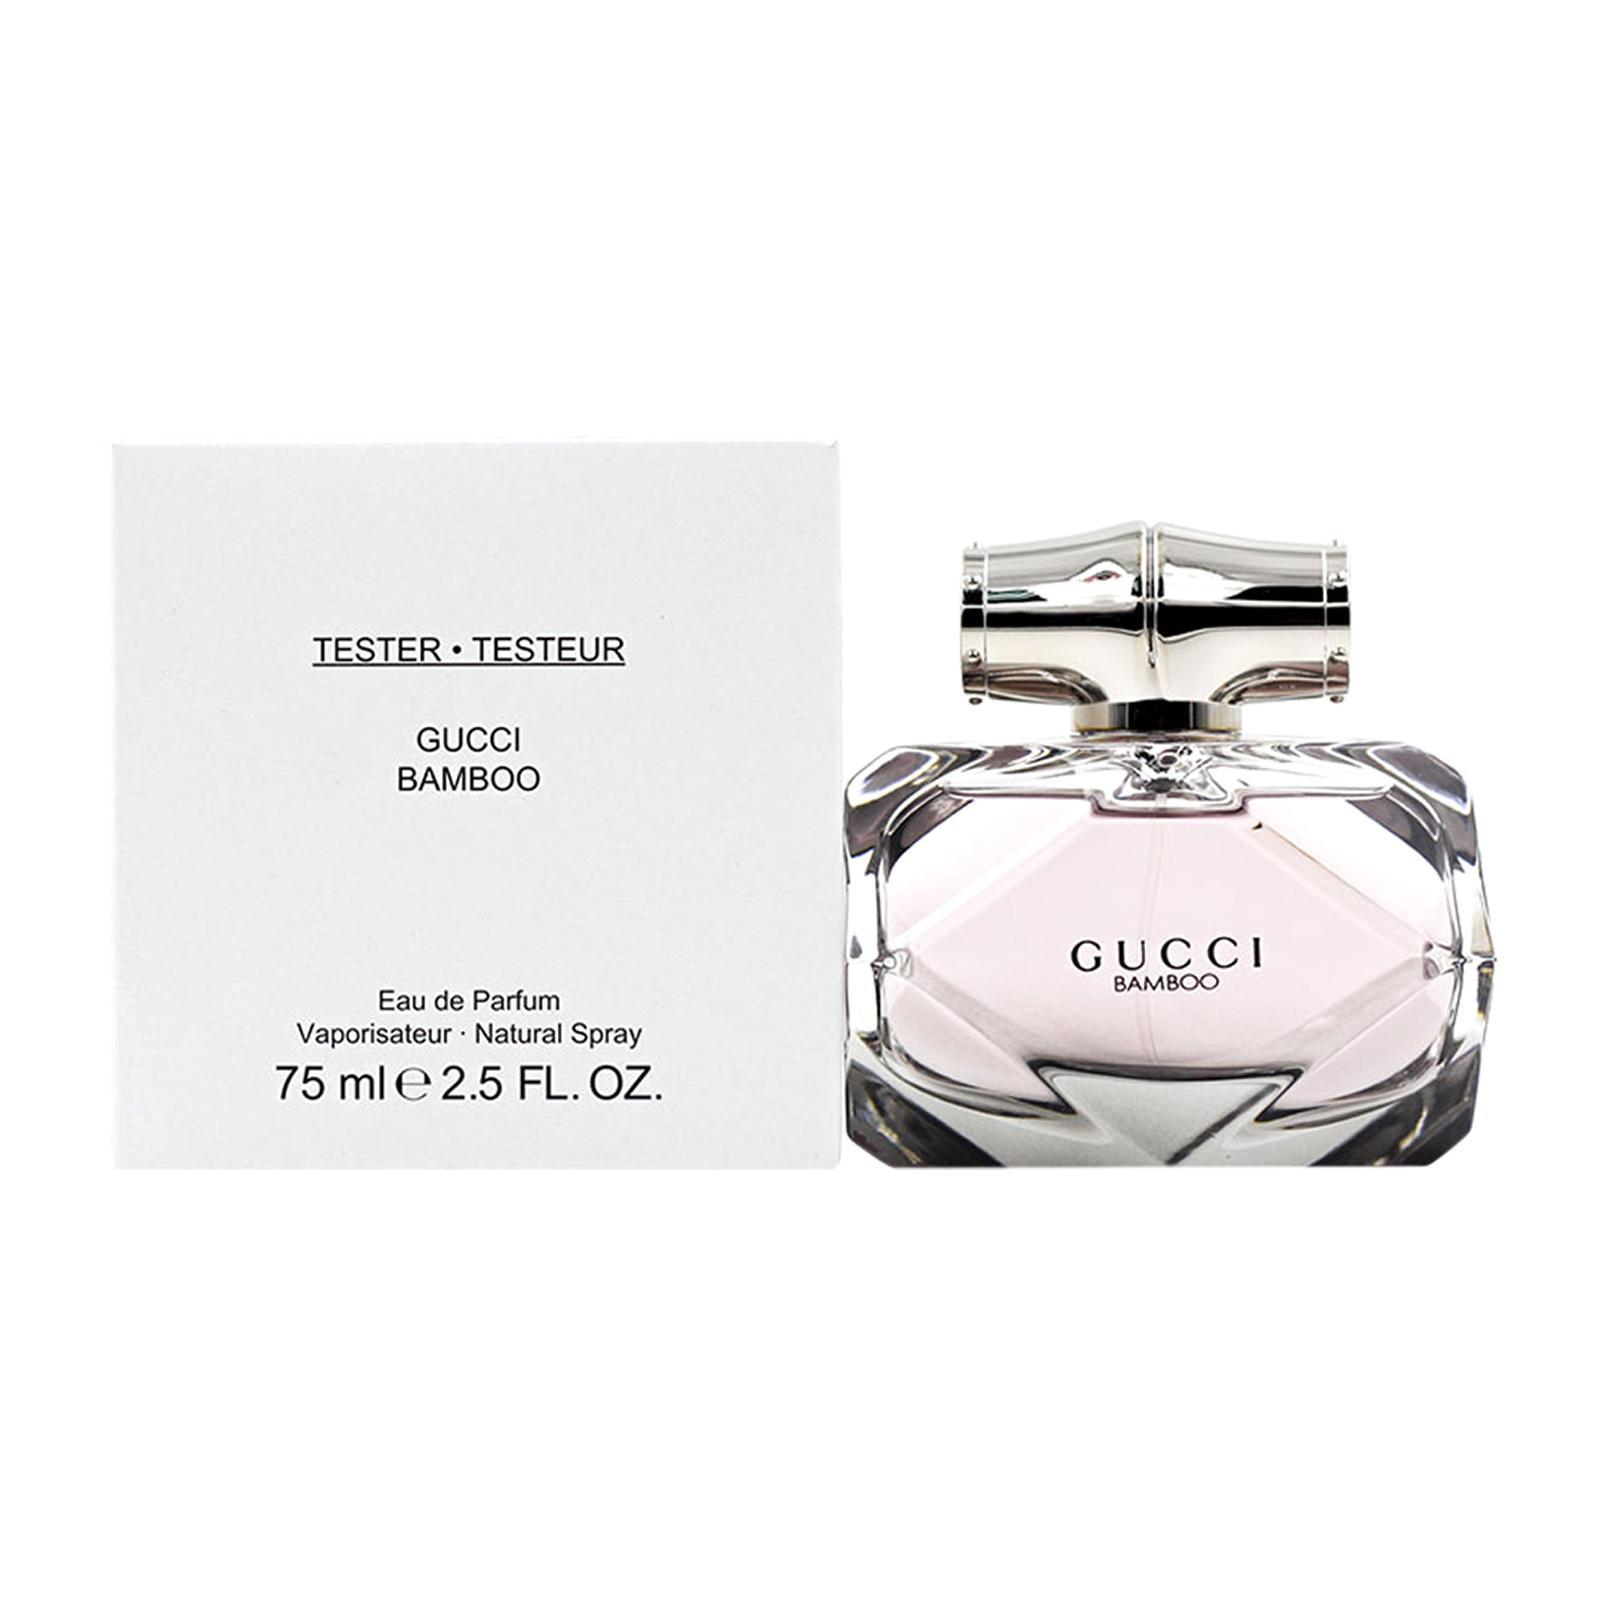 492caa44b Latest Gucci Women Fragrance Products | Enjoy Huge Discounts | Lazada SG